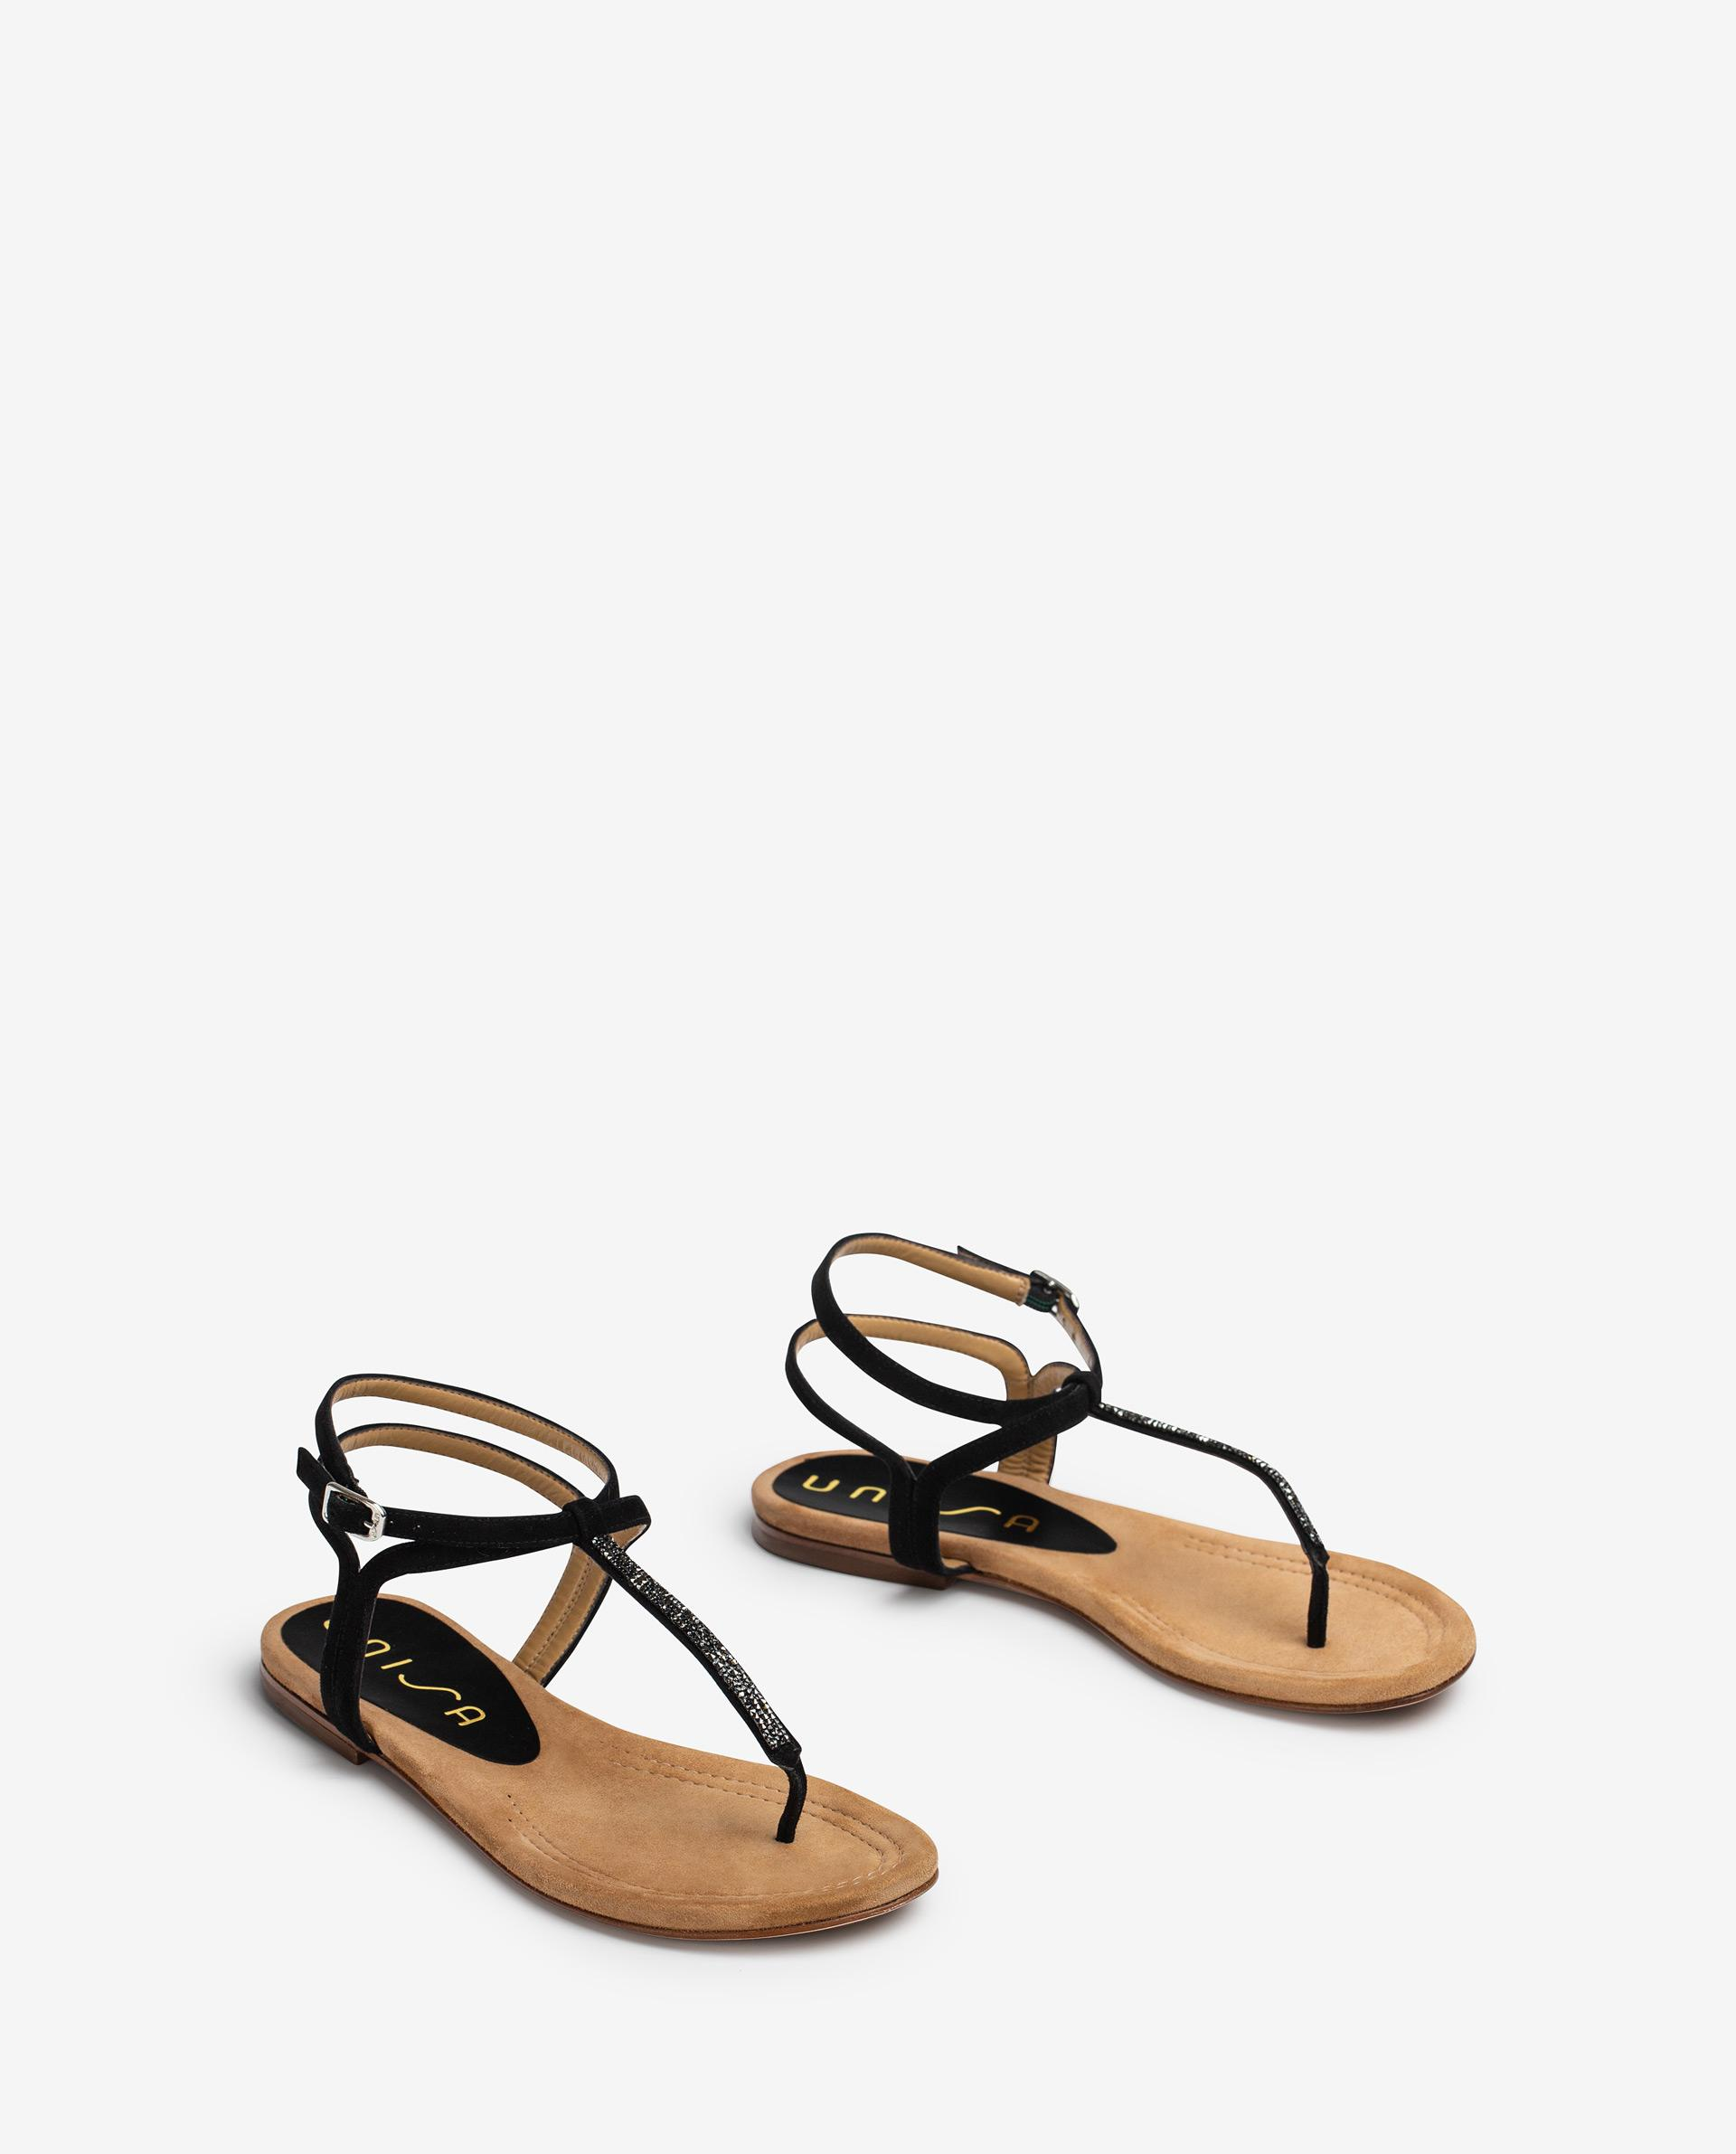 UNISA Flat Swarovski and kid suede thong sandals CHARLE_21_KS 2